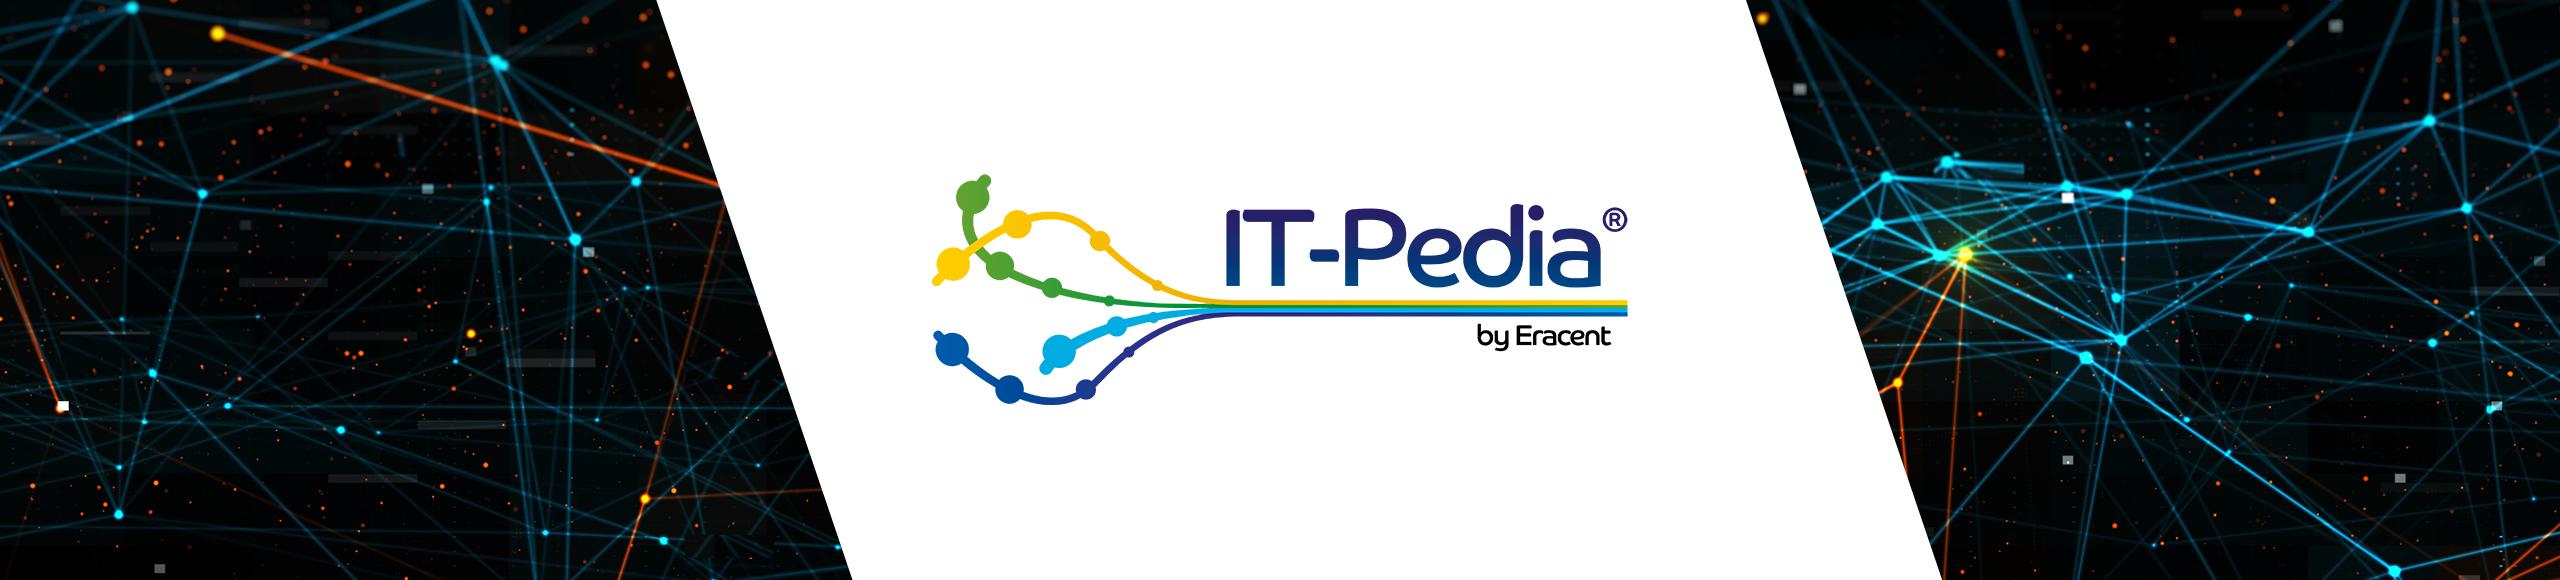 IT-Pedia banner (large)